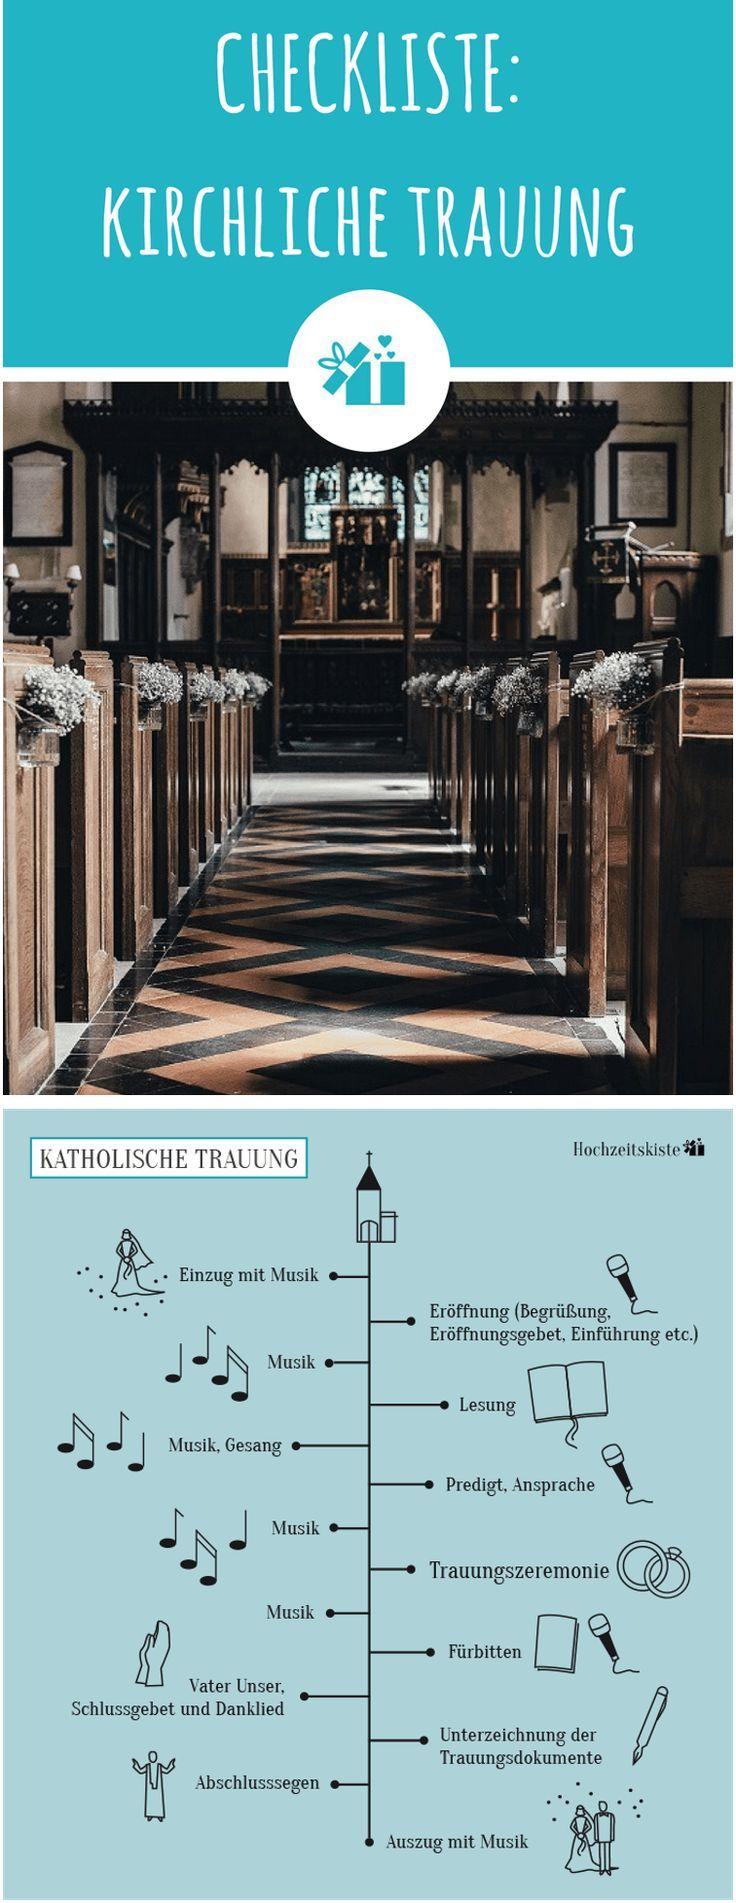 Boda en la iglesia: lista de verificación práctica como descarga gratuita en PDF